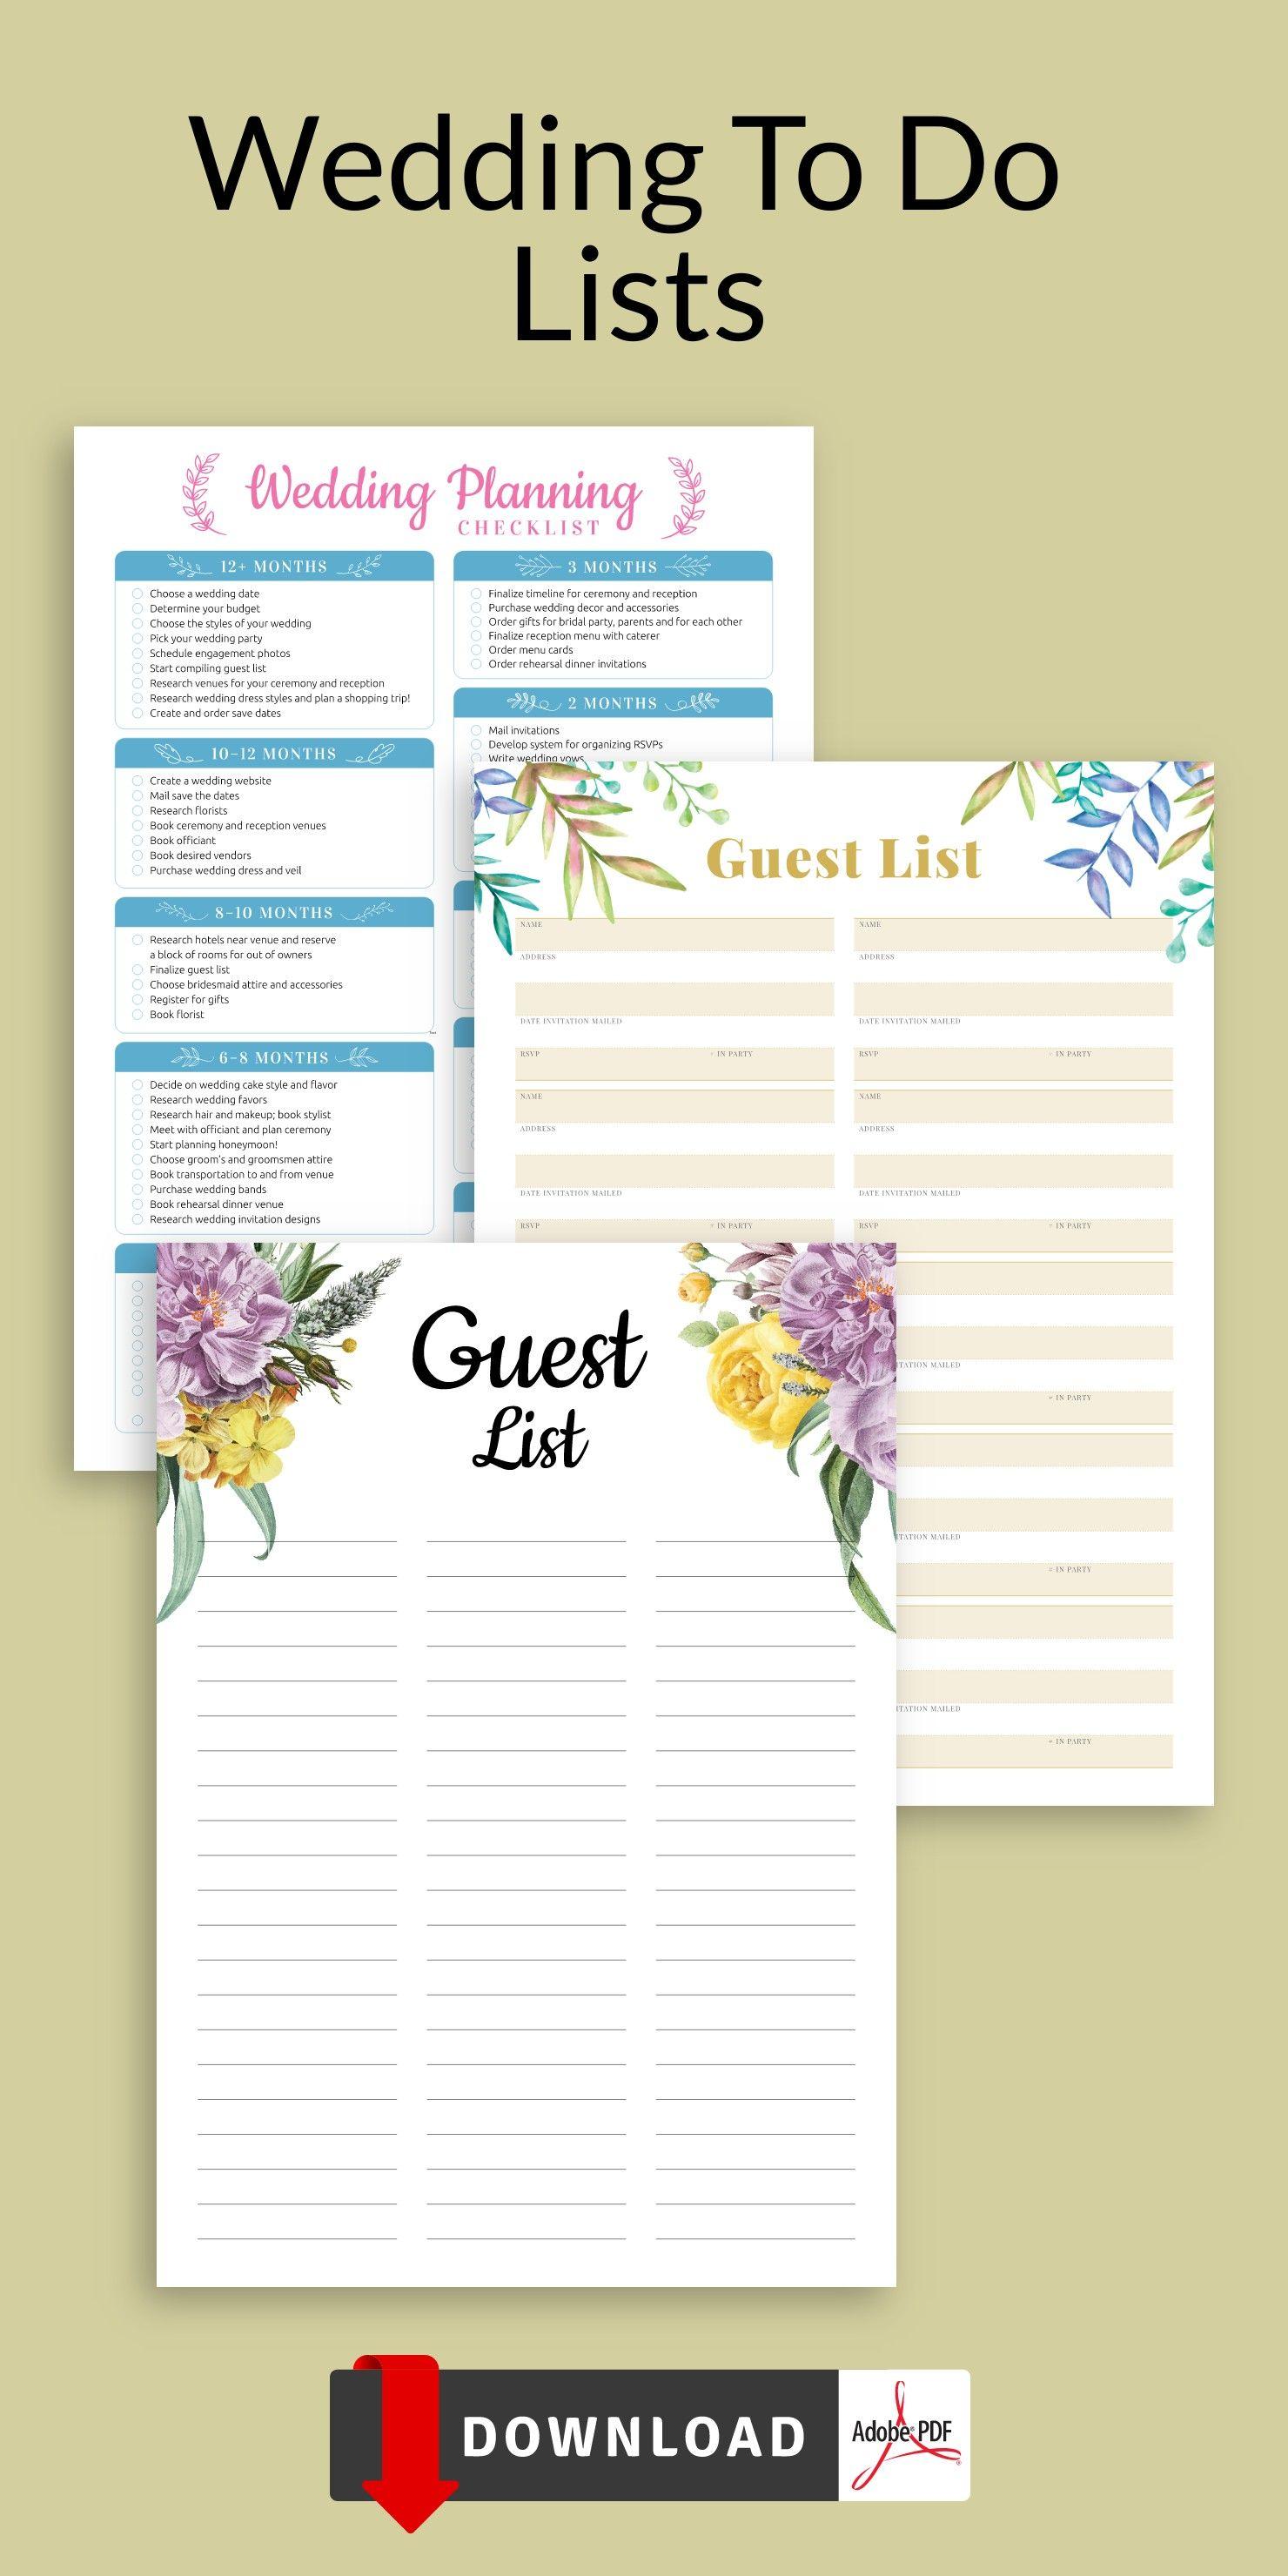 Wedding To Do Lists Wedding Planning To Do List To Do List Layout Wedding To Do List To Do List Wedding Planning Checklist Wedding to do list template